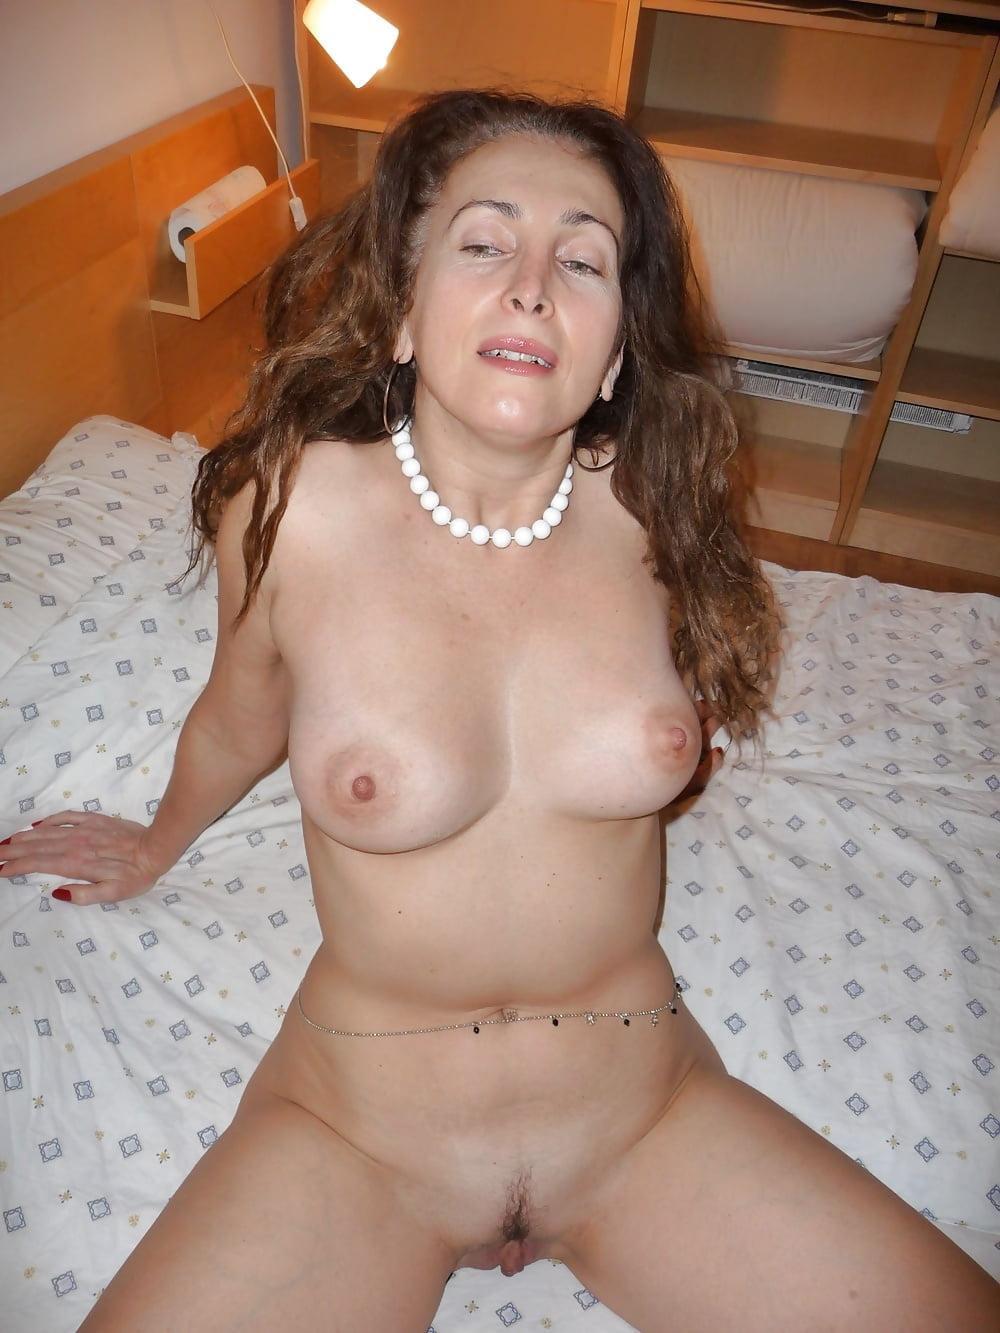 Porn movie Sex video of female celebrity